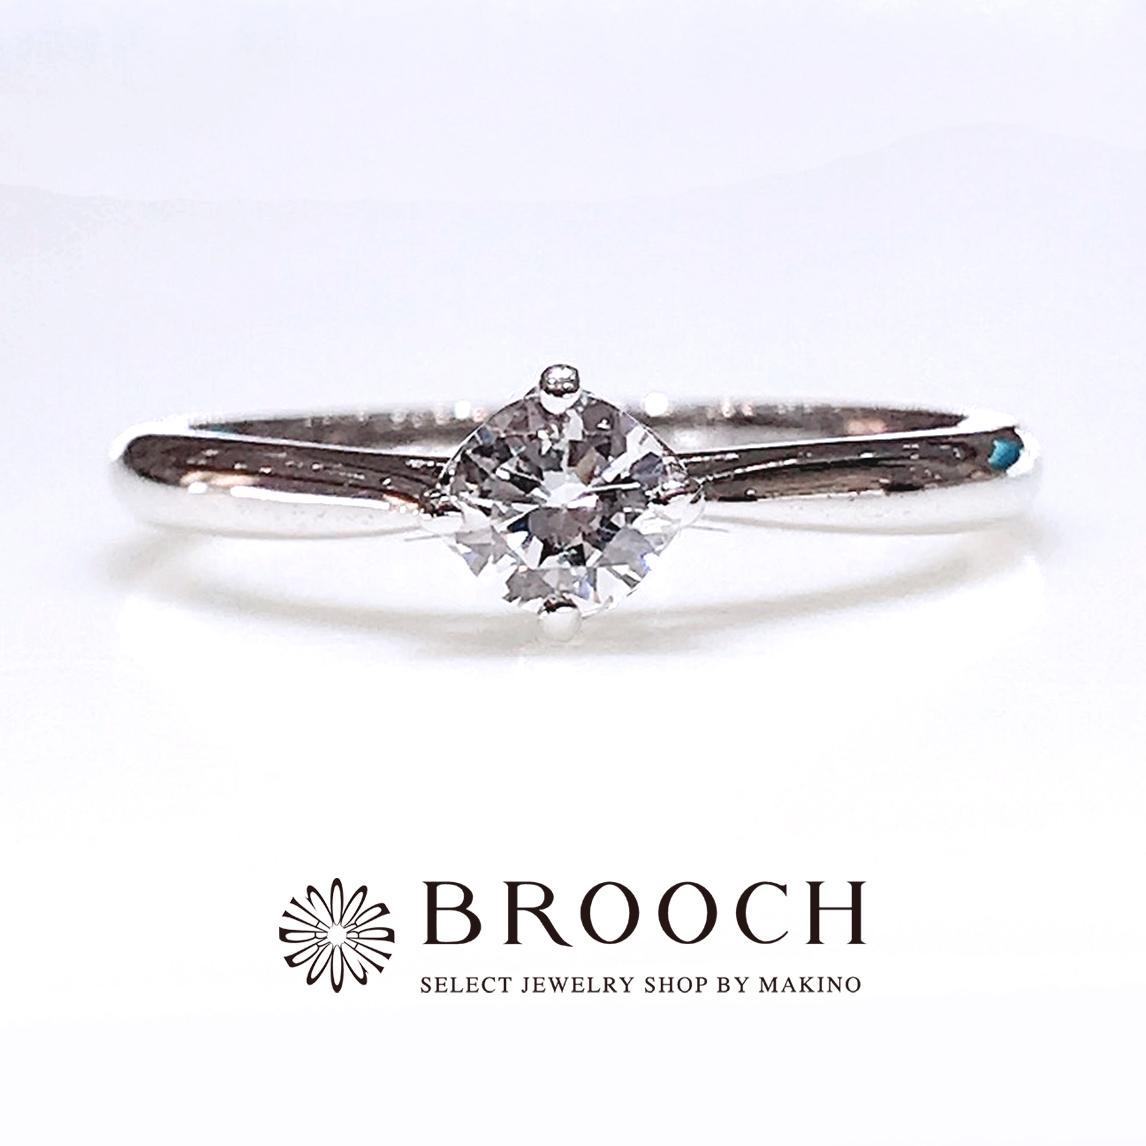 BROOCH 婚約指輪 エンゲージリング シンプルストレート4点留めデザイン